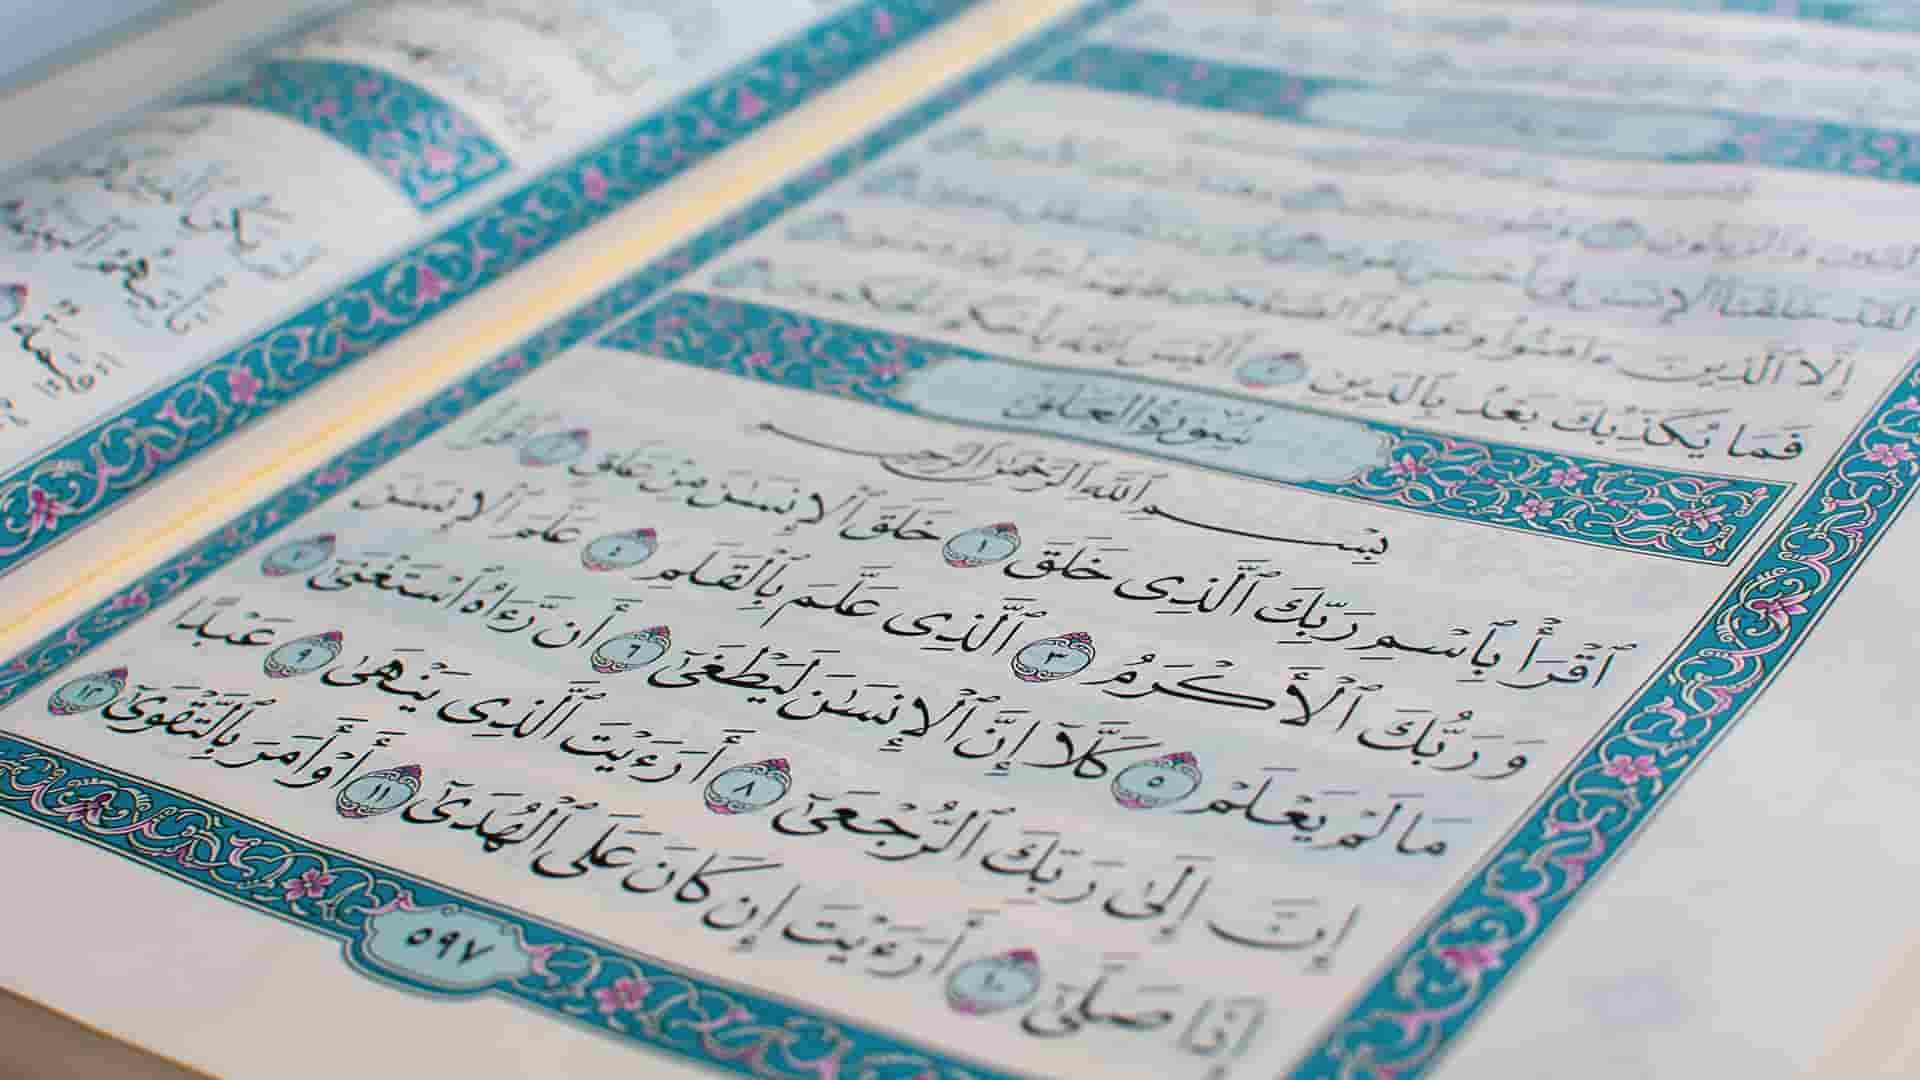 مدرسه قرآنی مناهل